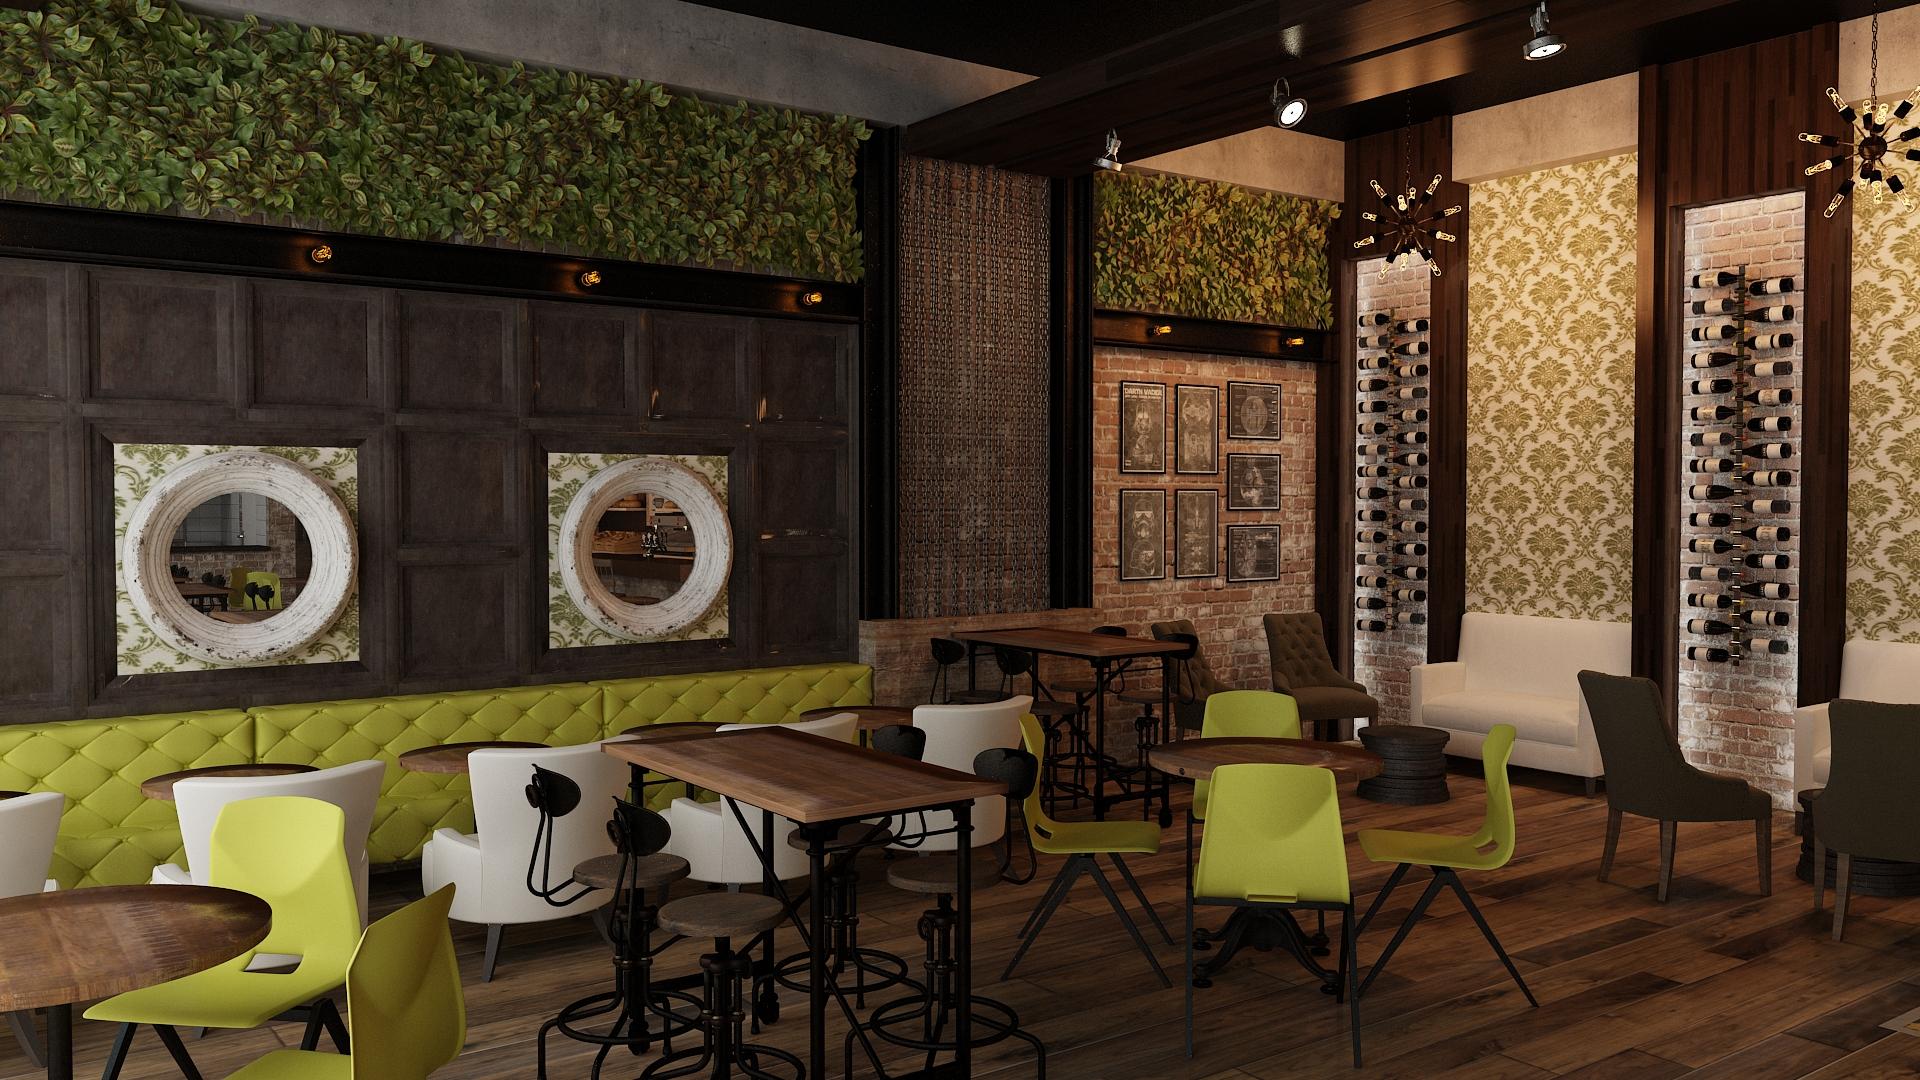 Cafe wine bar 04